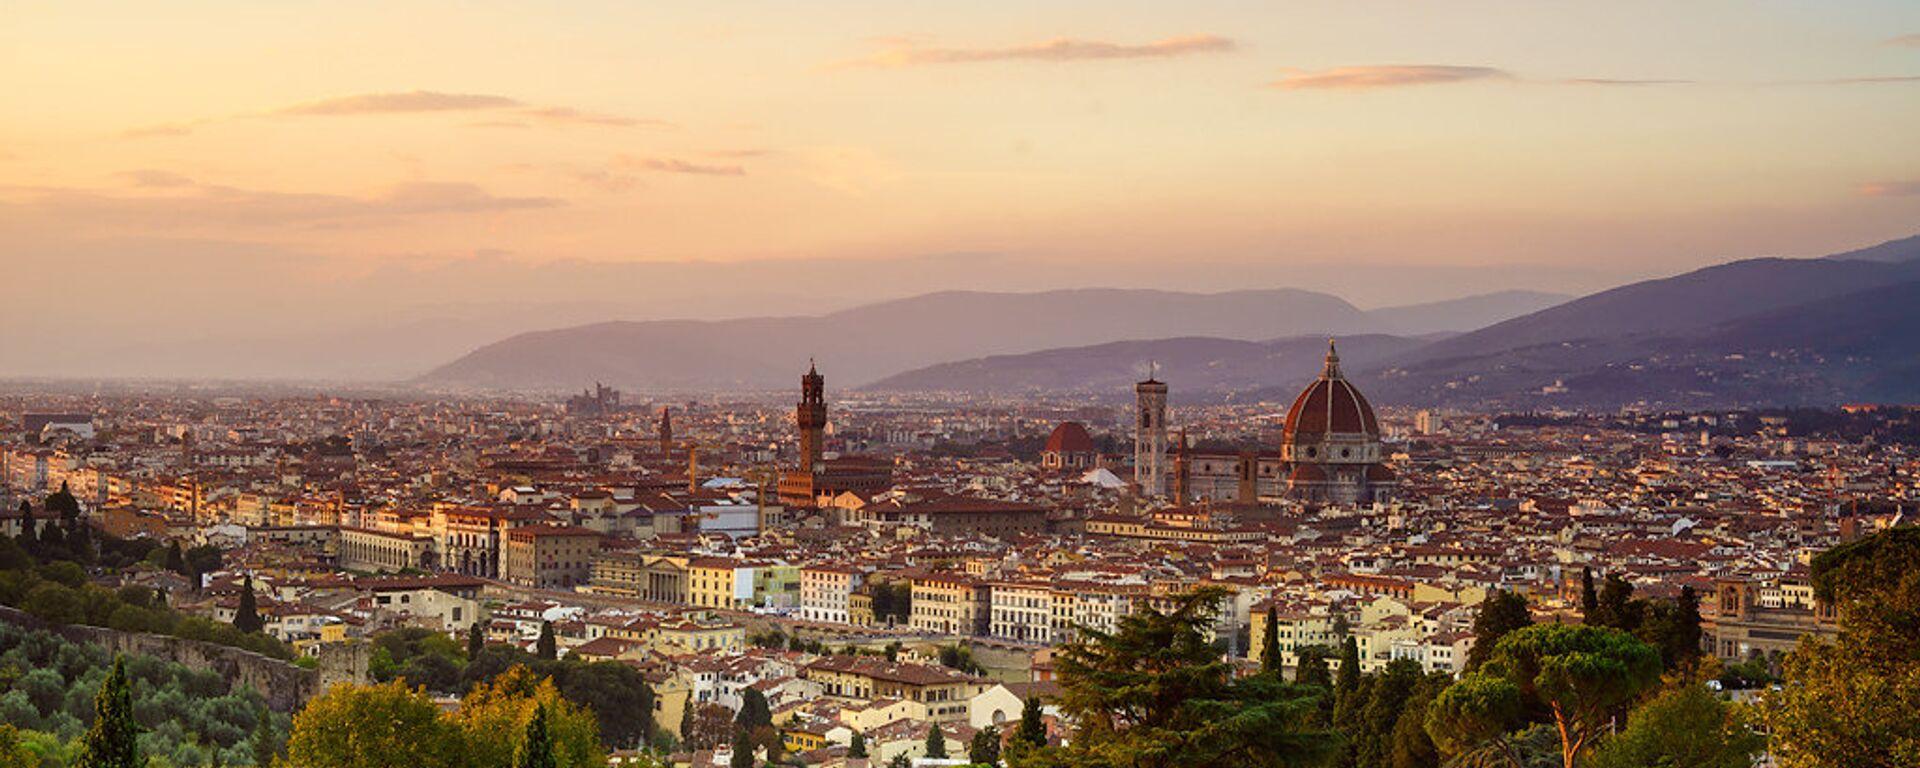 Firenze, Toscana - Sputnik Italia, 1920, 14.01.2021